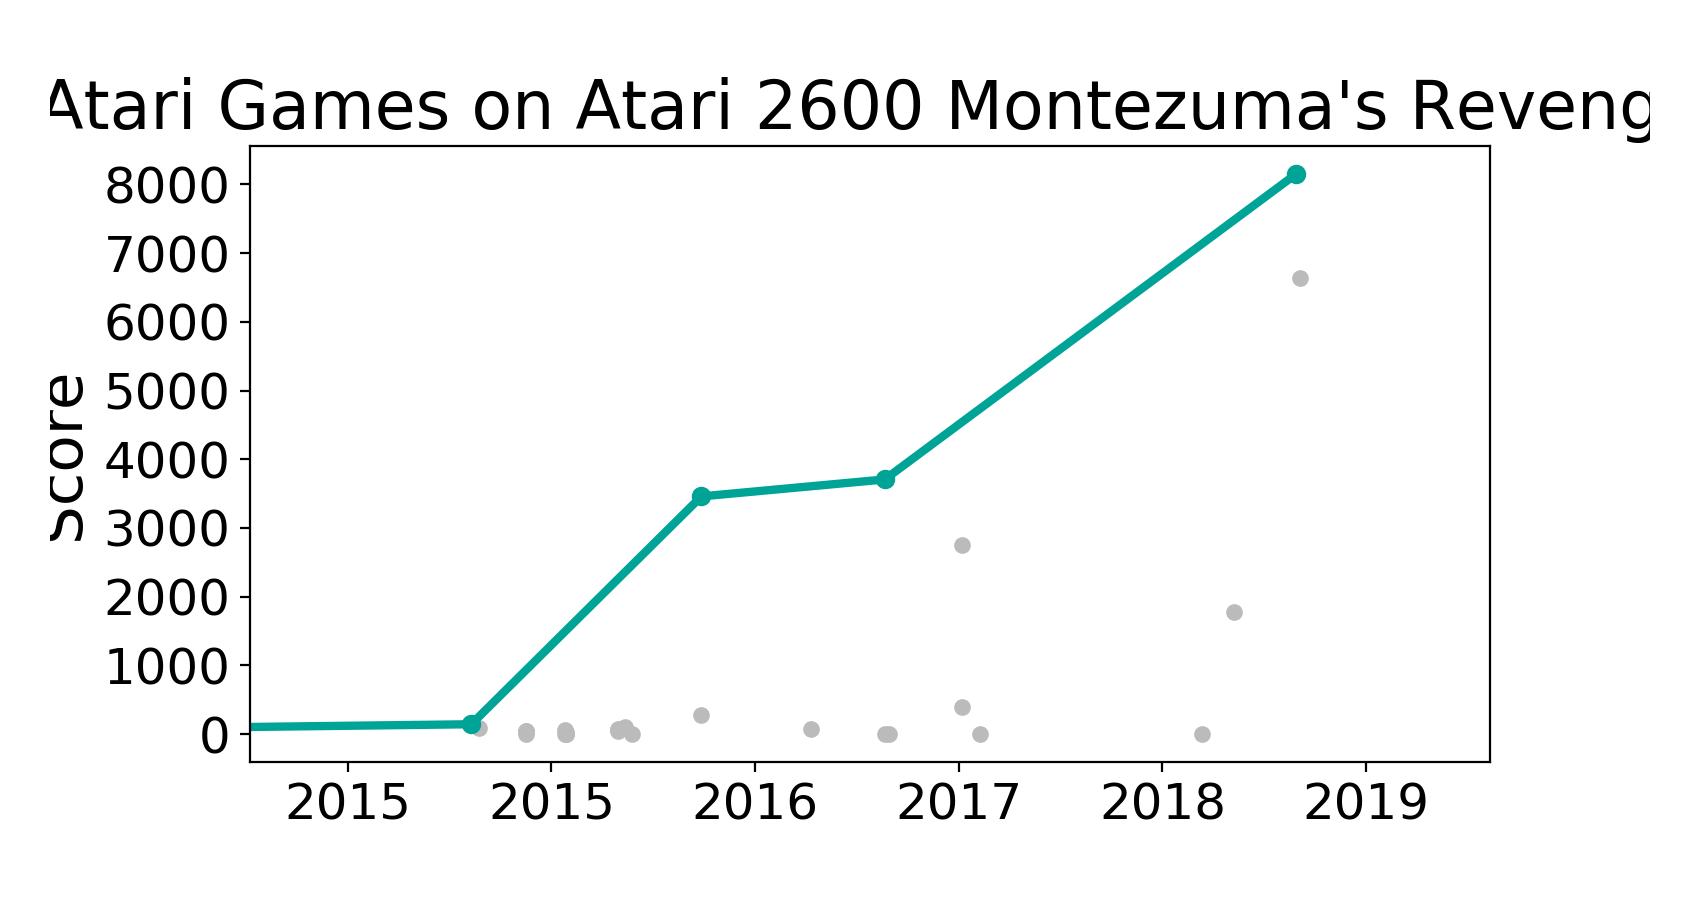 State-of-the-art table for Atari Games on Atari 2600 Montezuma's Revenge